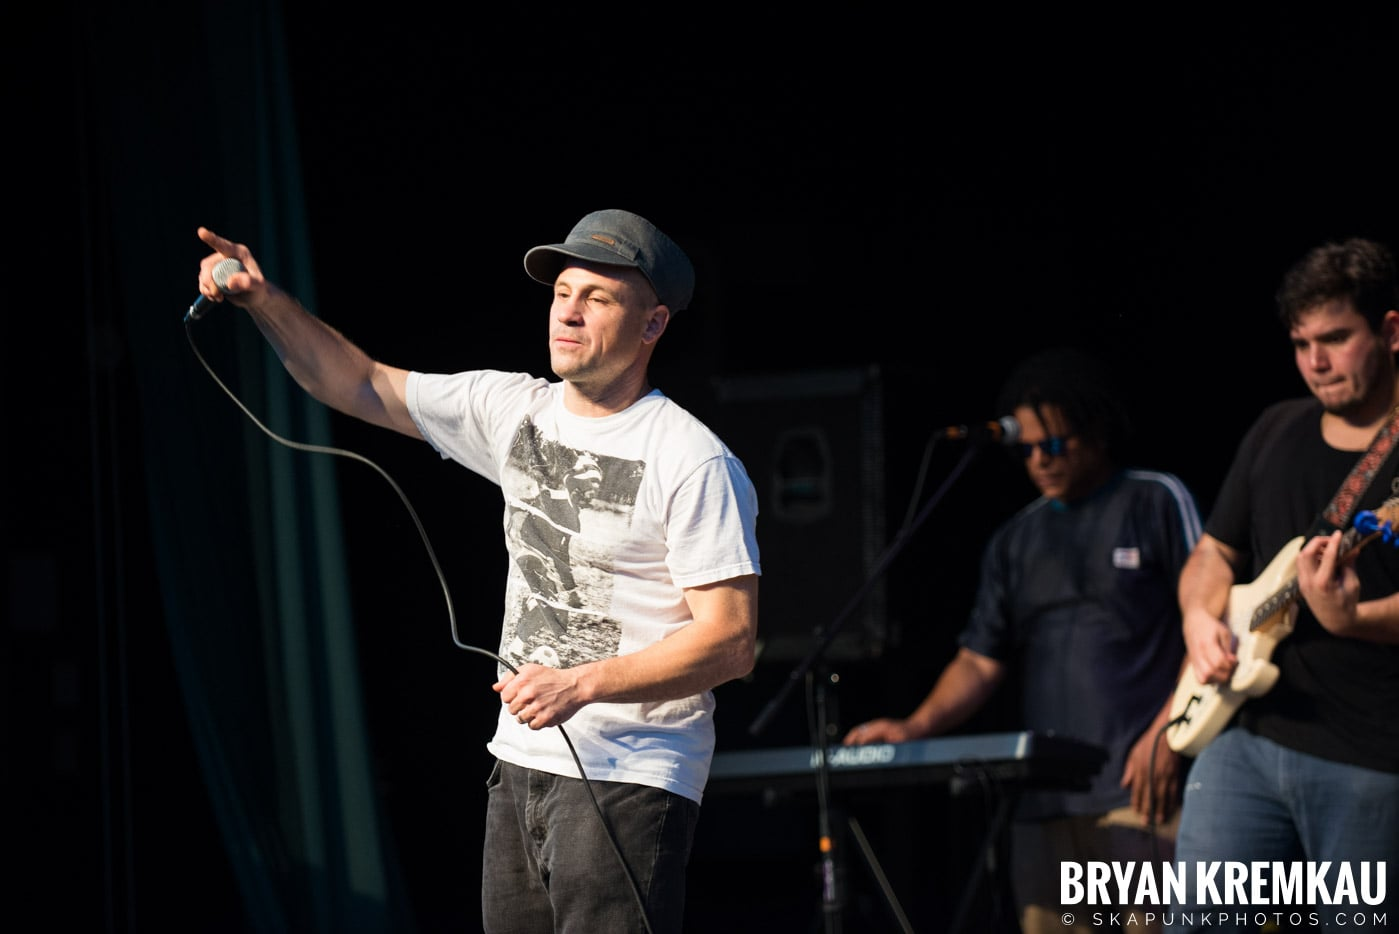 The Rudie Crew @ Oskar Schindler Performing Arts Center, West Orange, NJ - 8.19.17 (15)